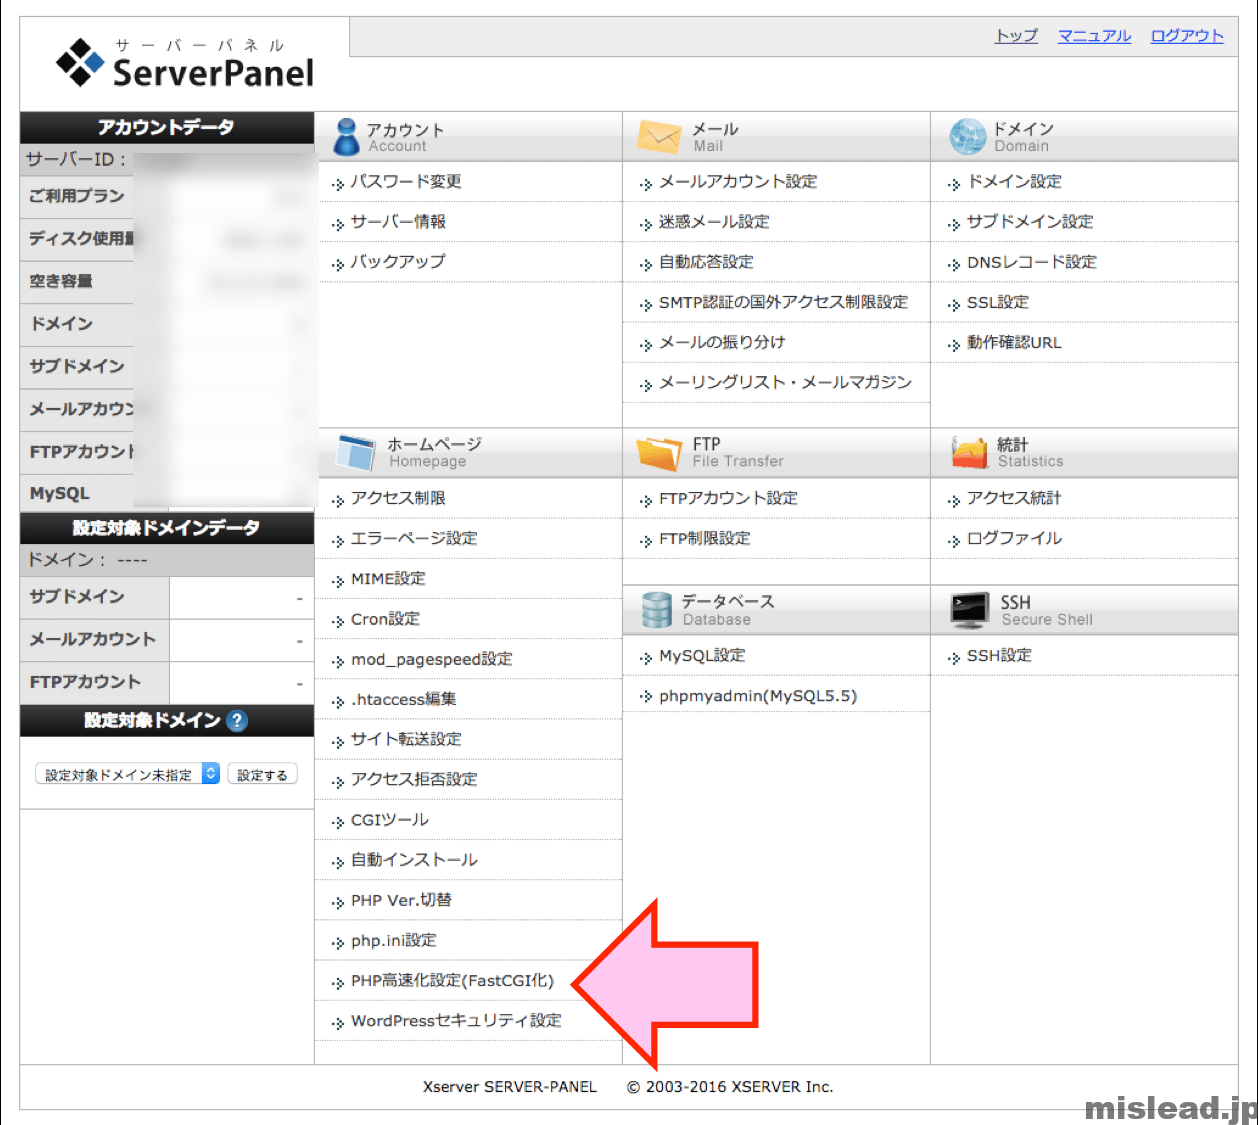 Xserver コントロールパネル FastCGI選択